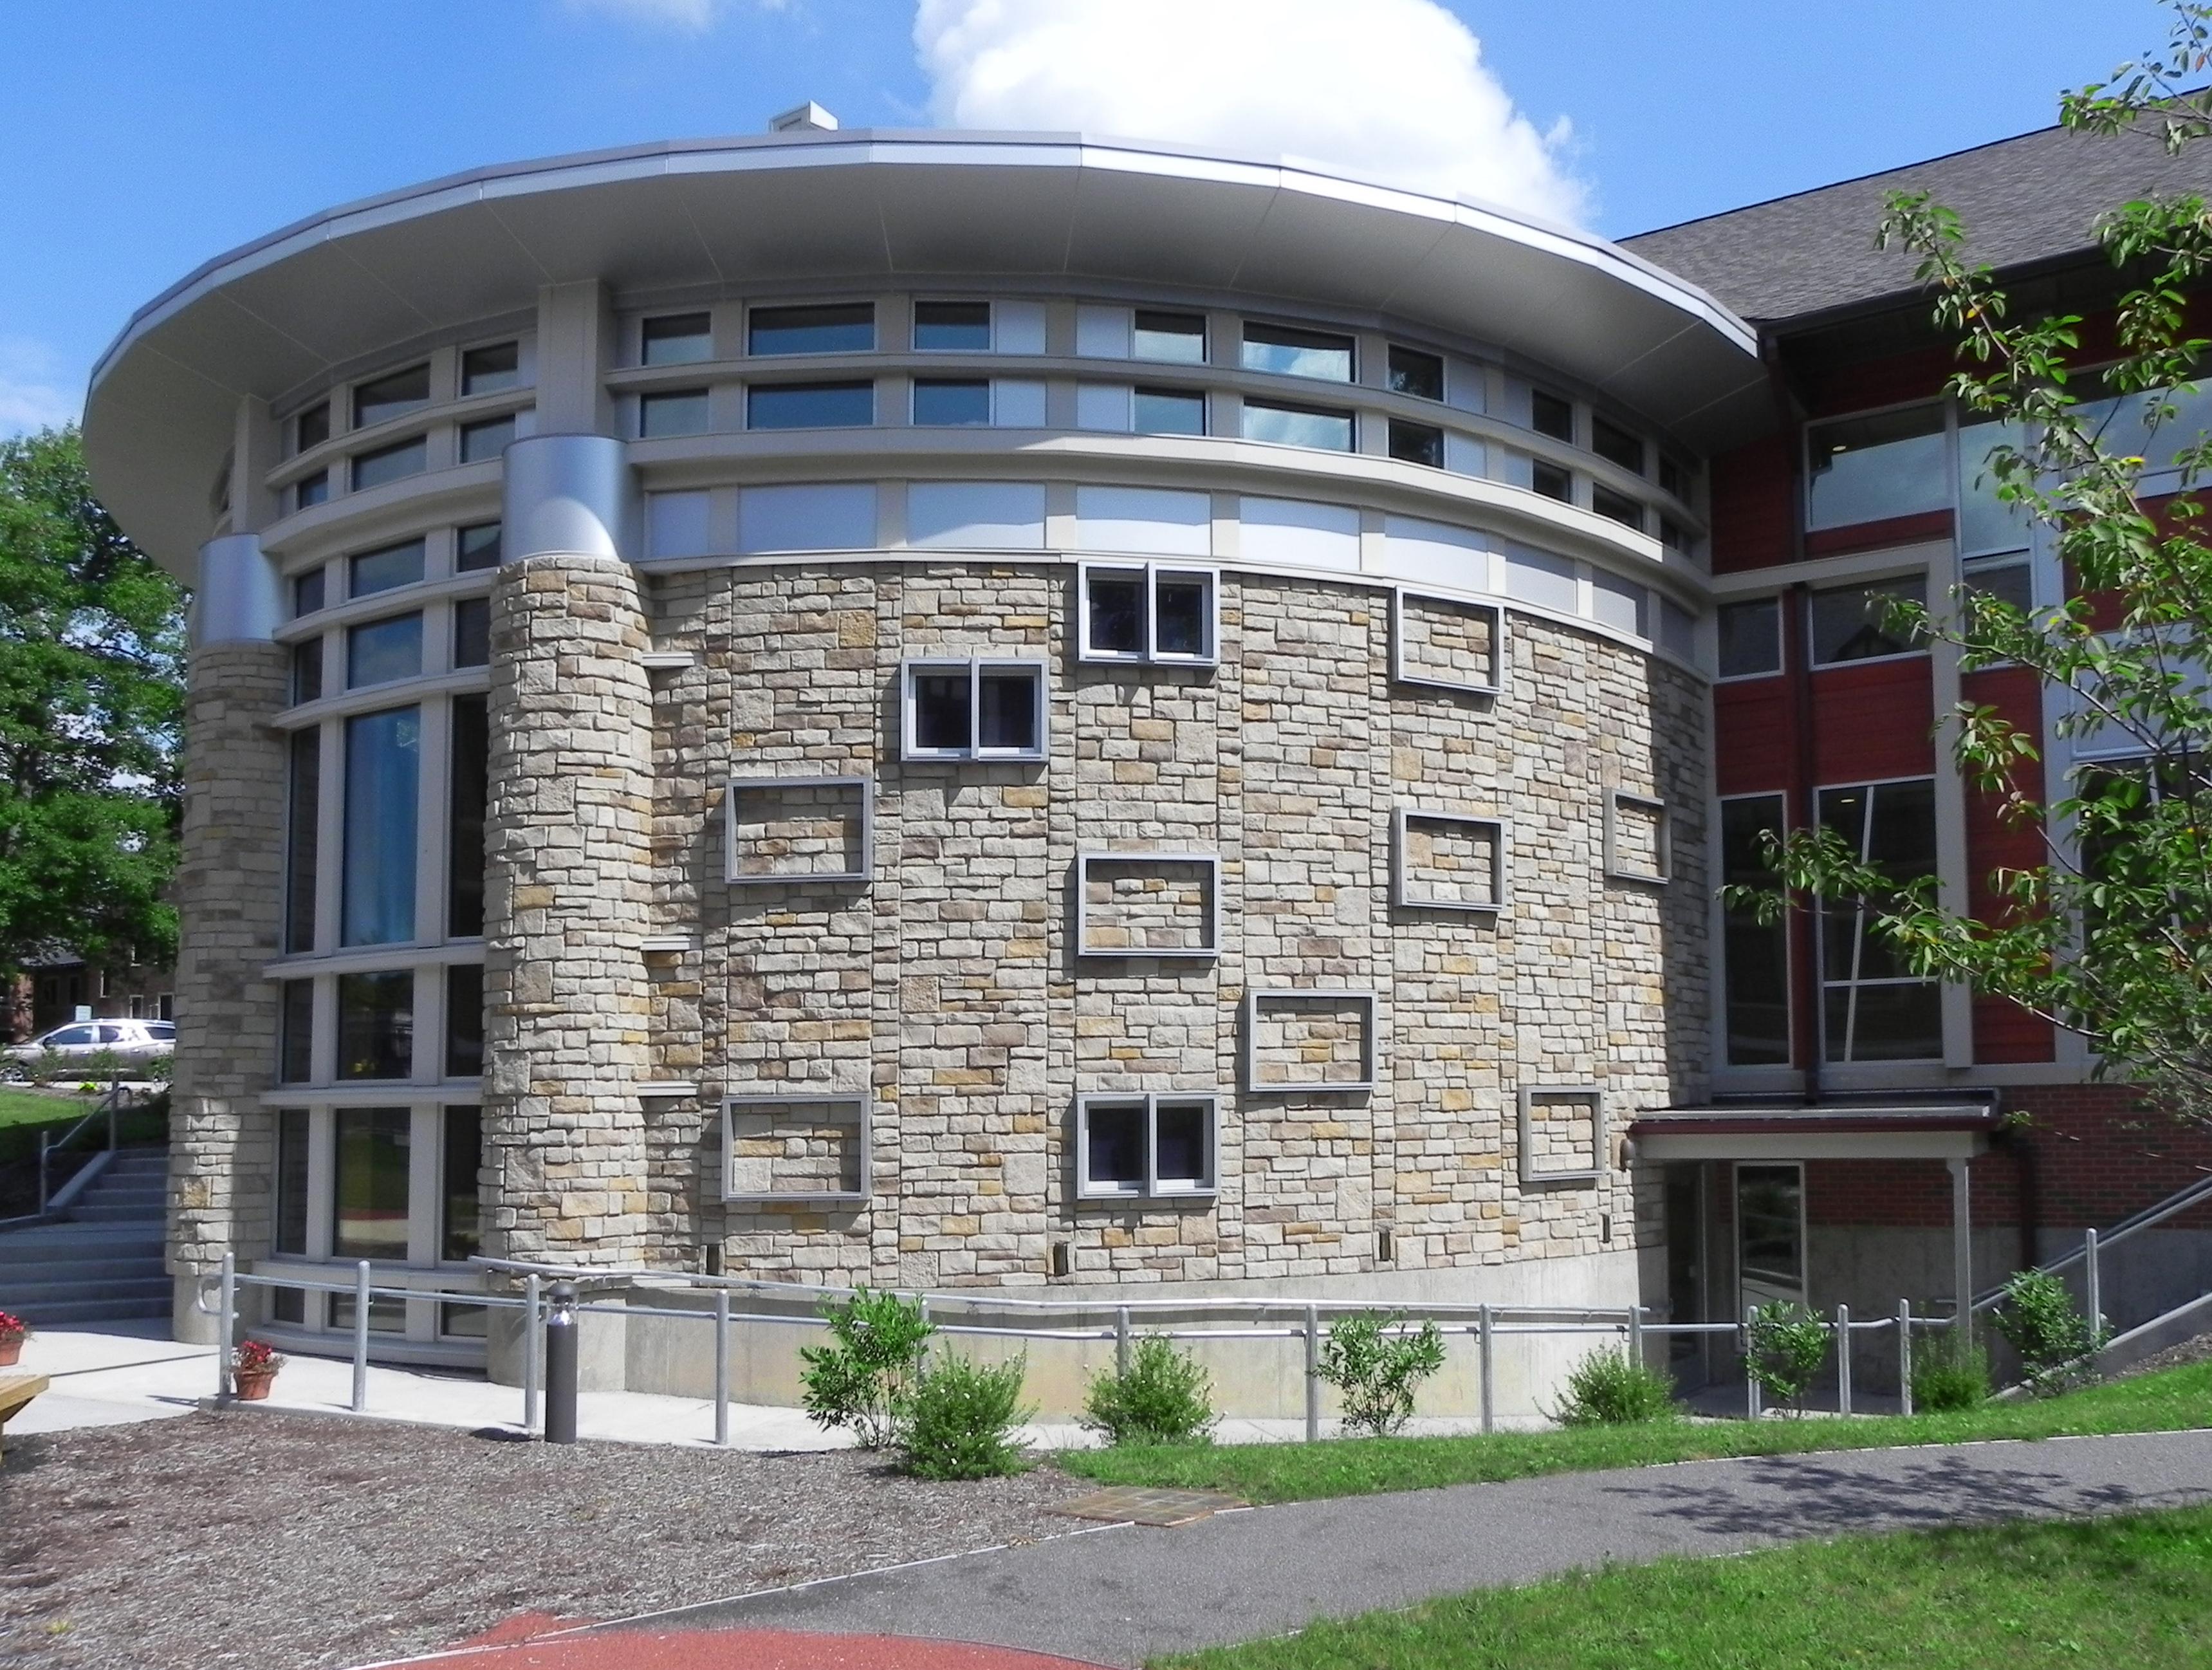 circular stone building